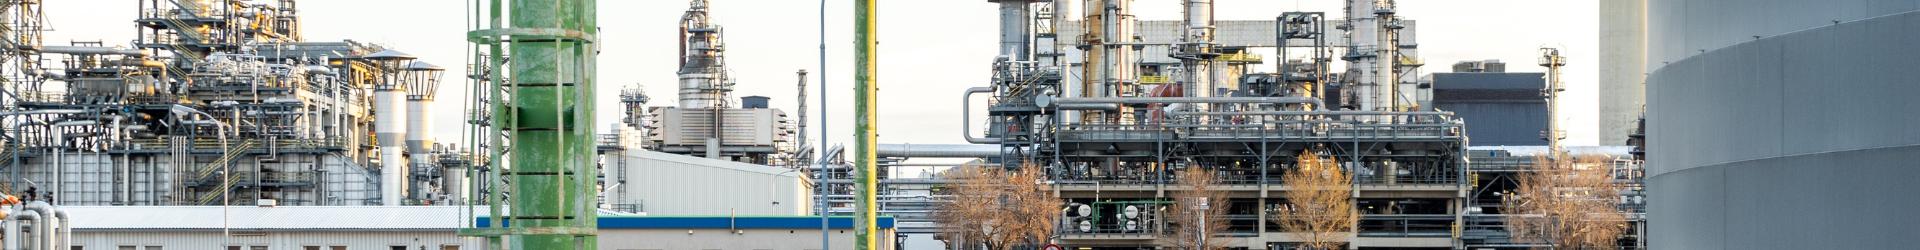 impianto industriale rischio biologico